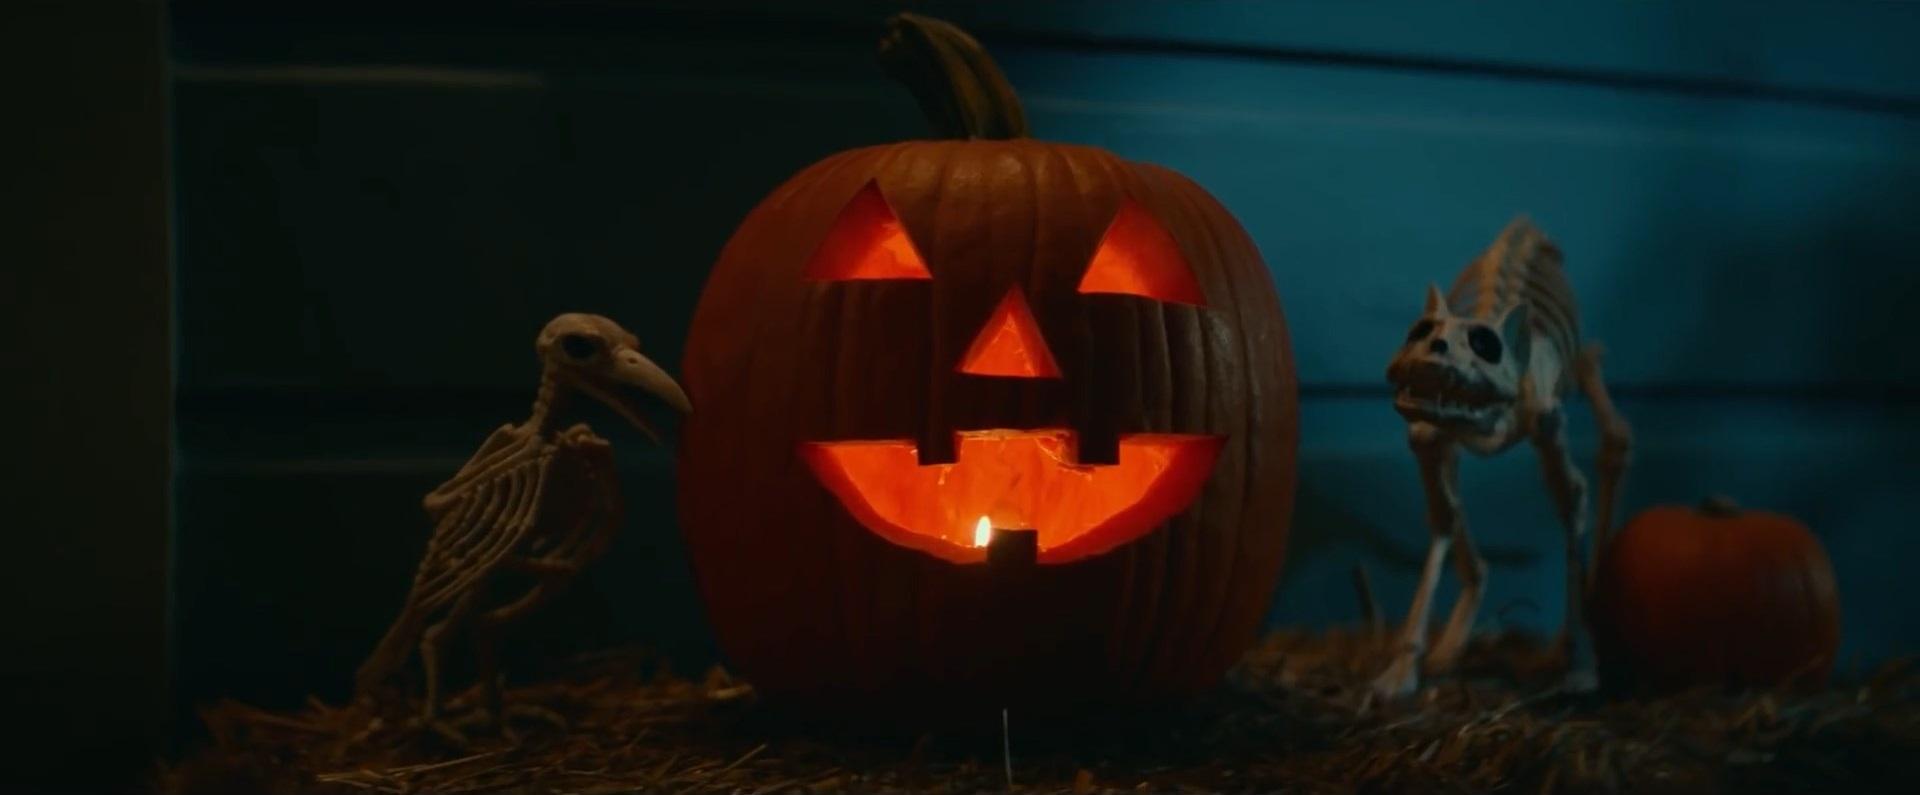 Хэллоуин убивает Тизер №2